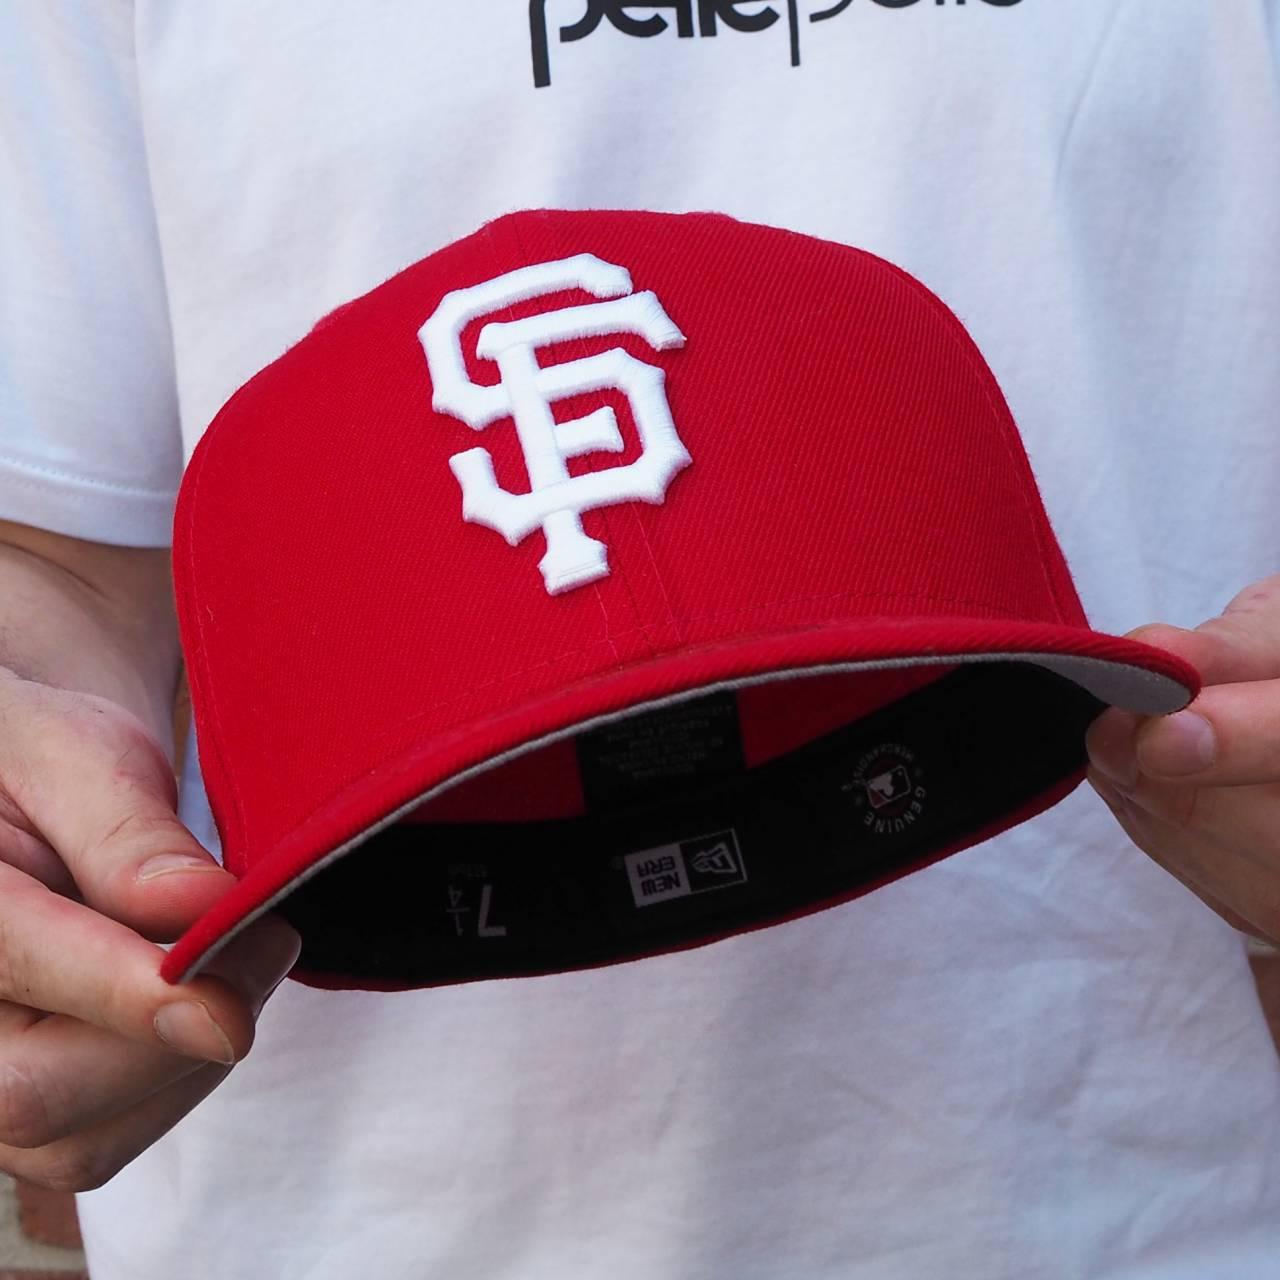 80373210 EXCLUSIVE 59FIFTY MLB SAN FRANCISCO GIANTS SCARLET/WHITE GREY UNDERBRIM